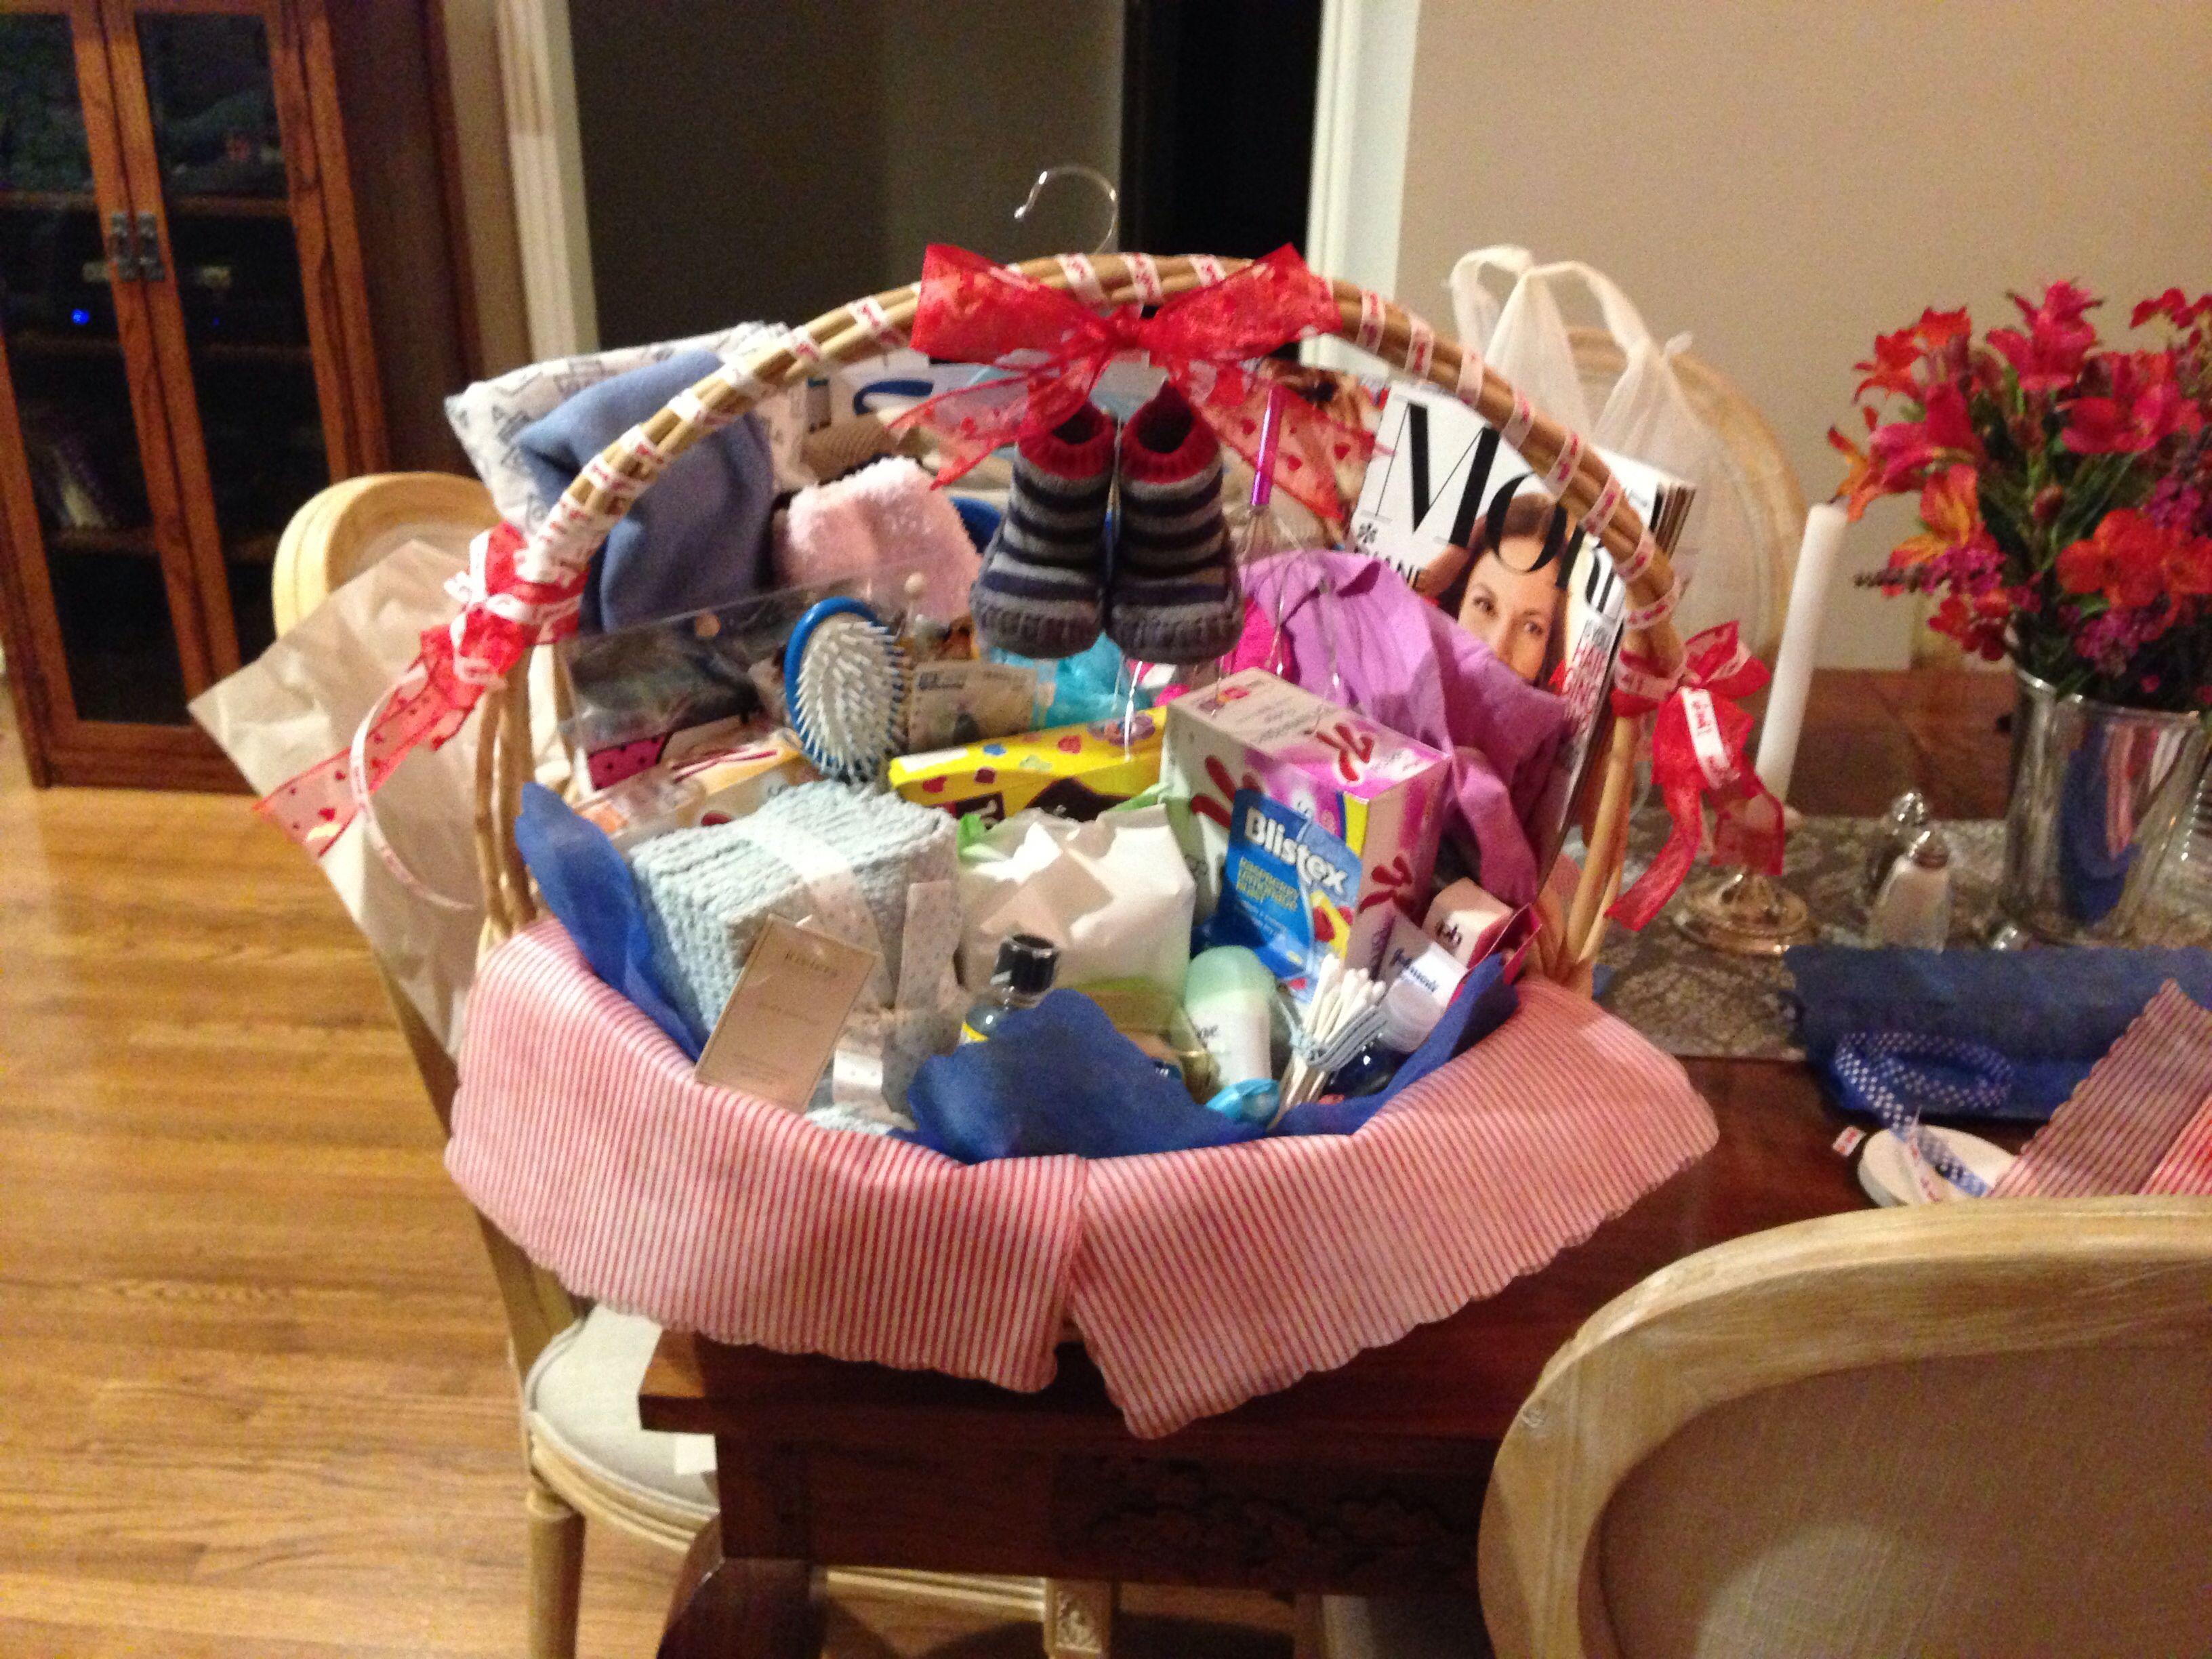 Hospital basket for new mom hospital baskets stockpile